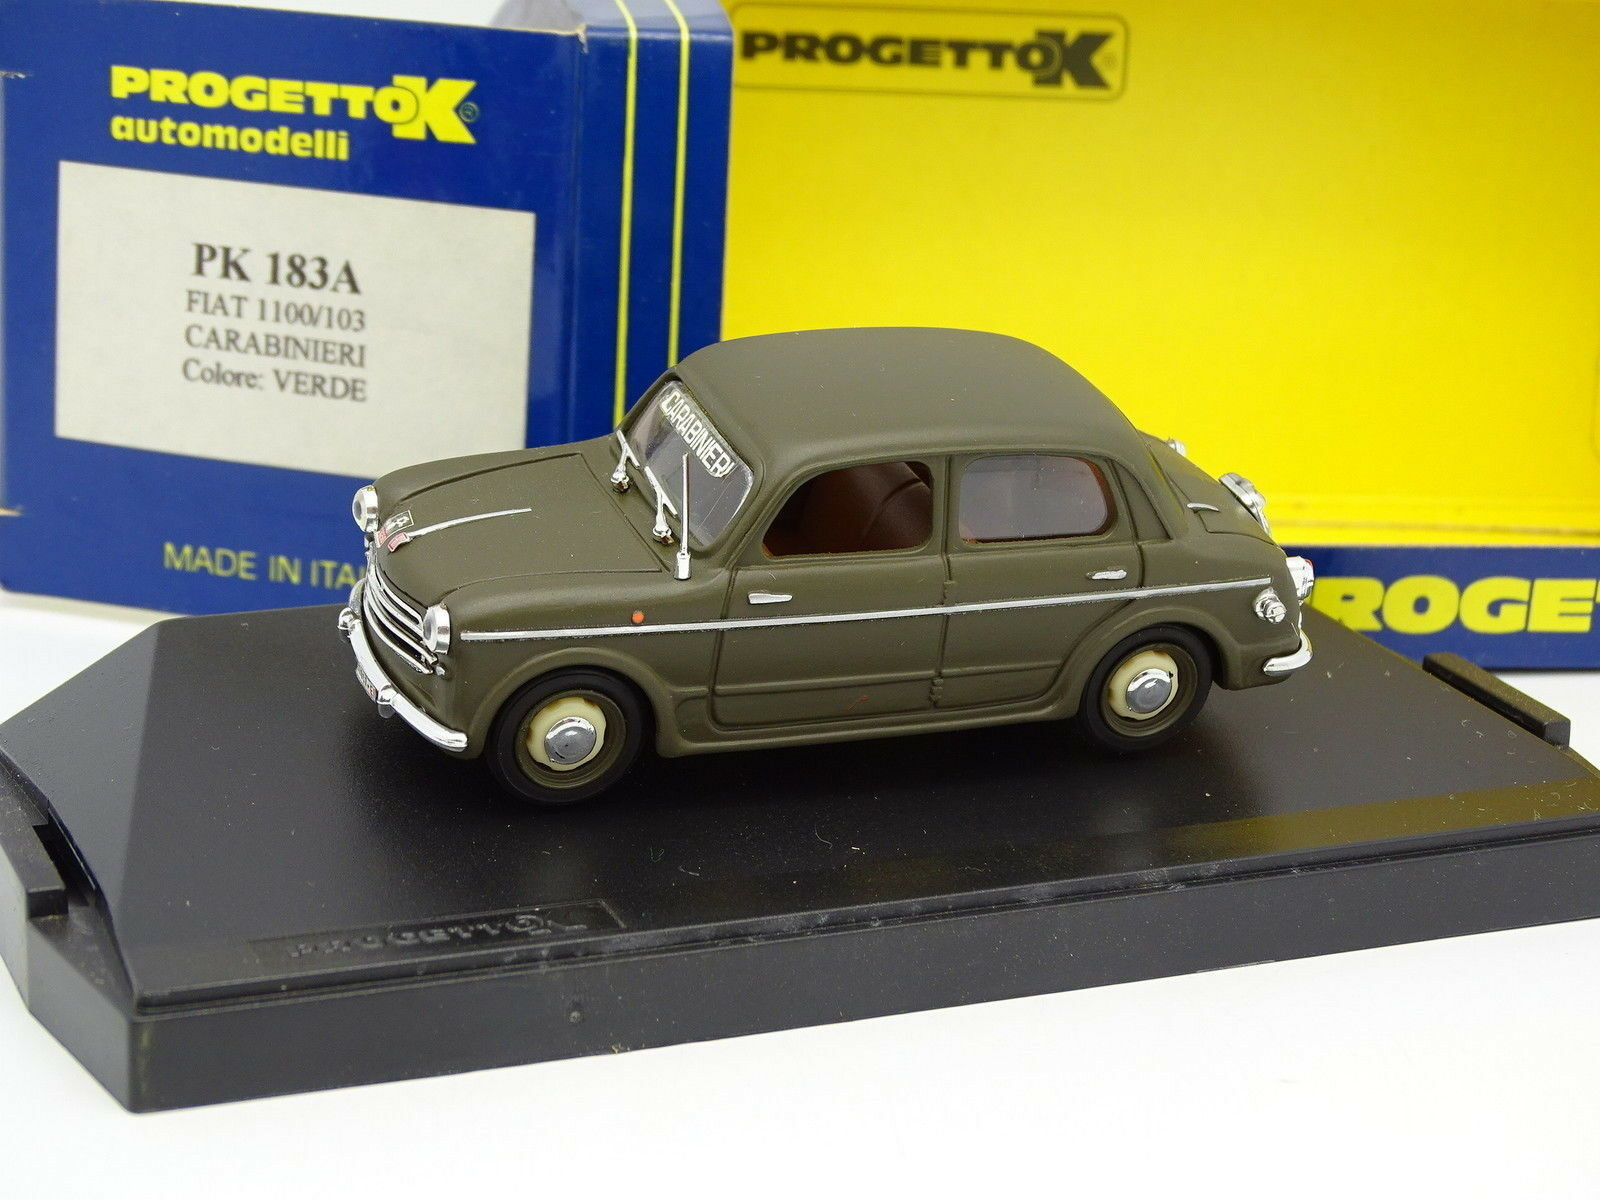 suministro directo de los fabricantes Progetto k 1 43 - Fiat Fiat Fiat 1100 103 Cocheabinieri Militar  perfecto